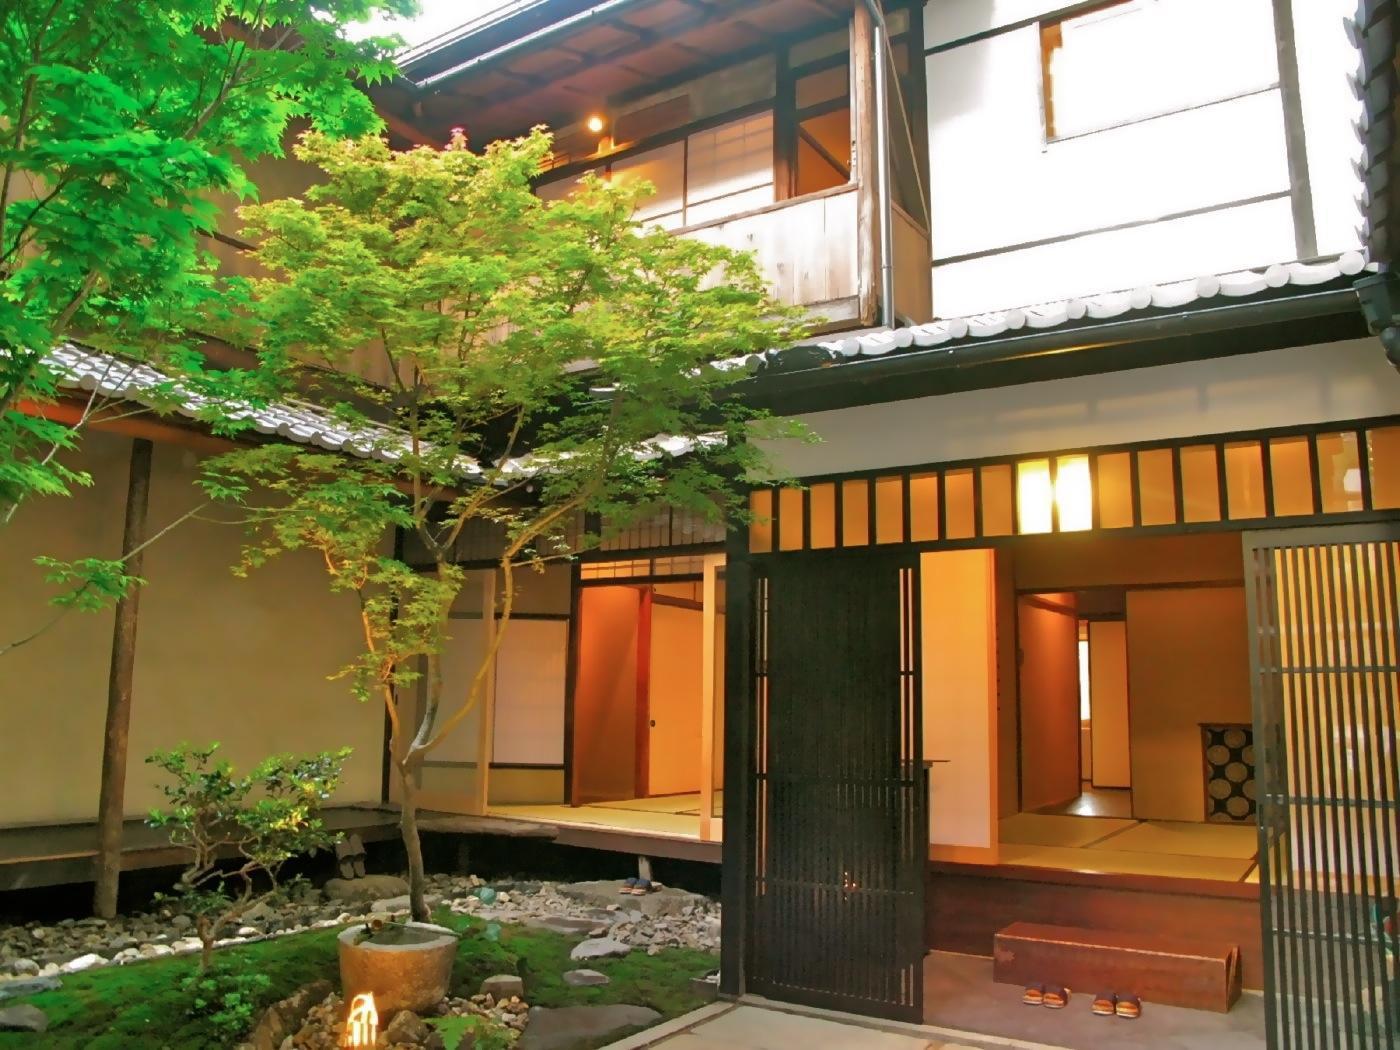 Iori Machiya Stay Residence - Kyoto